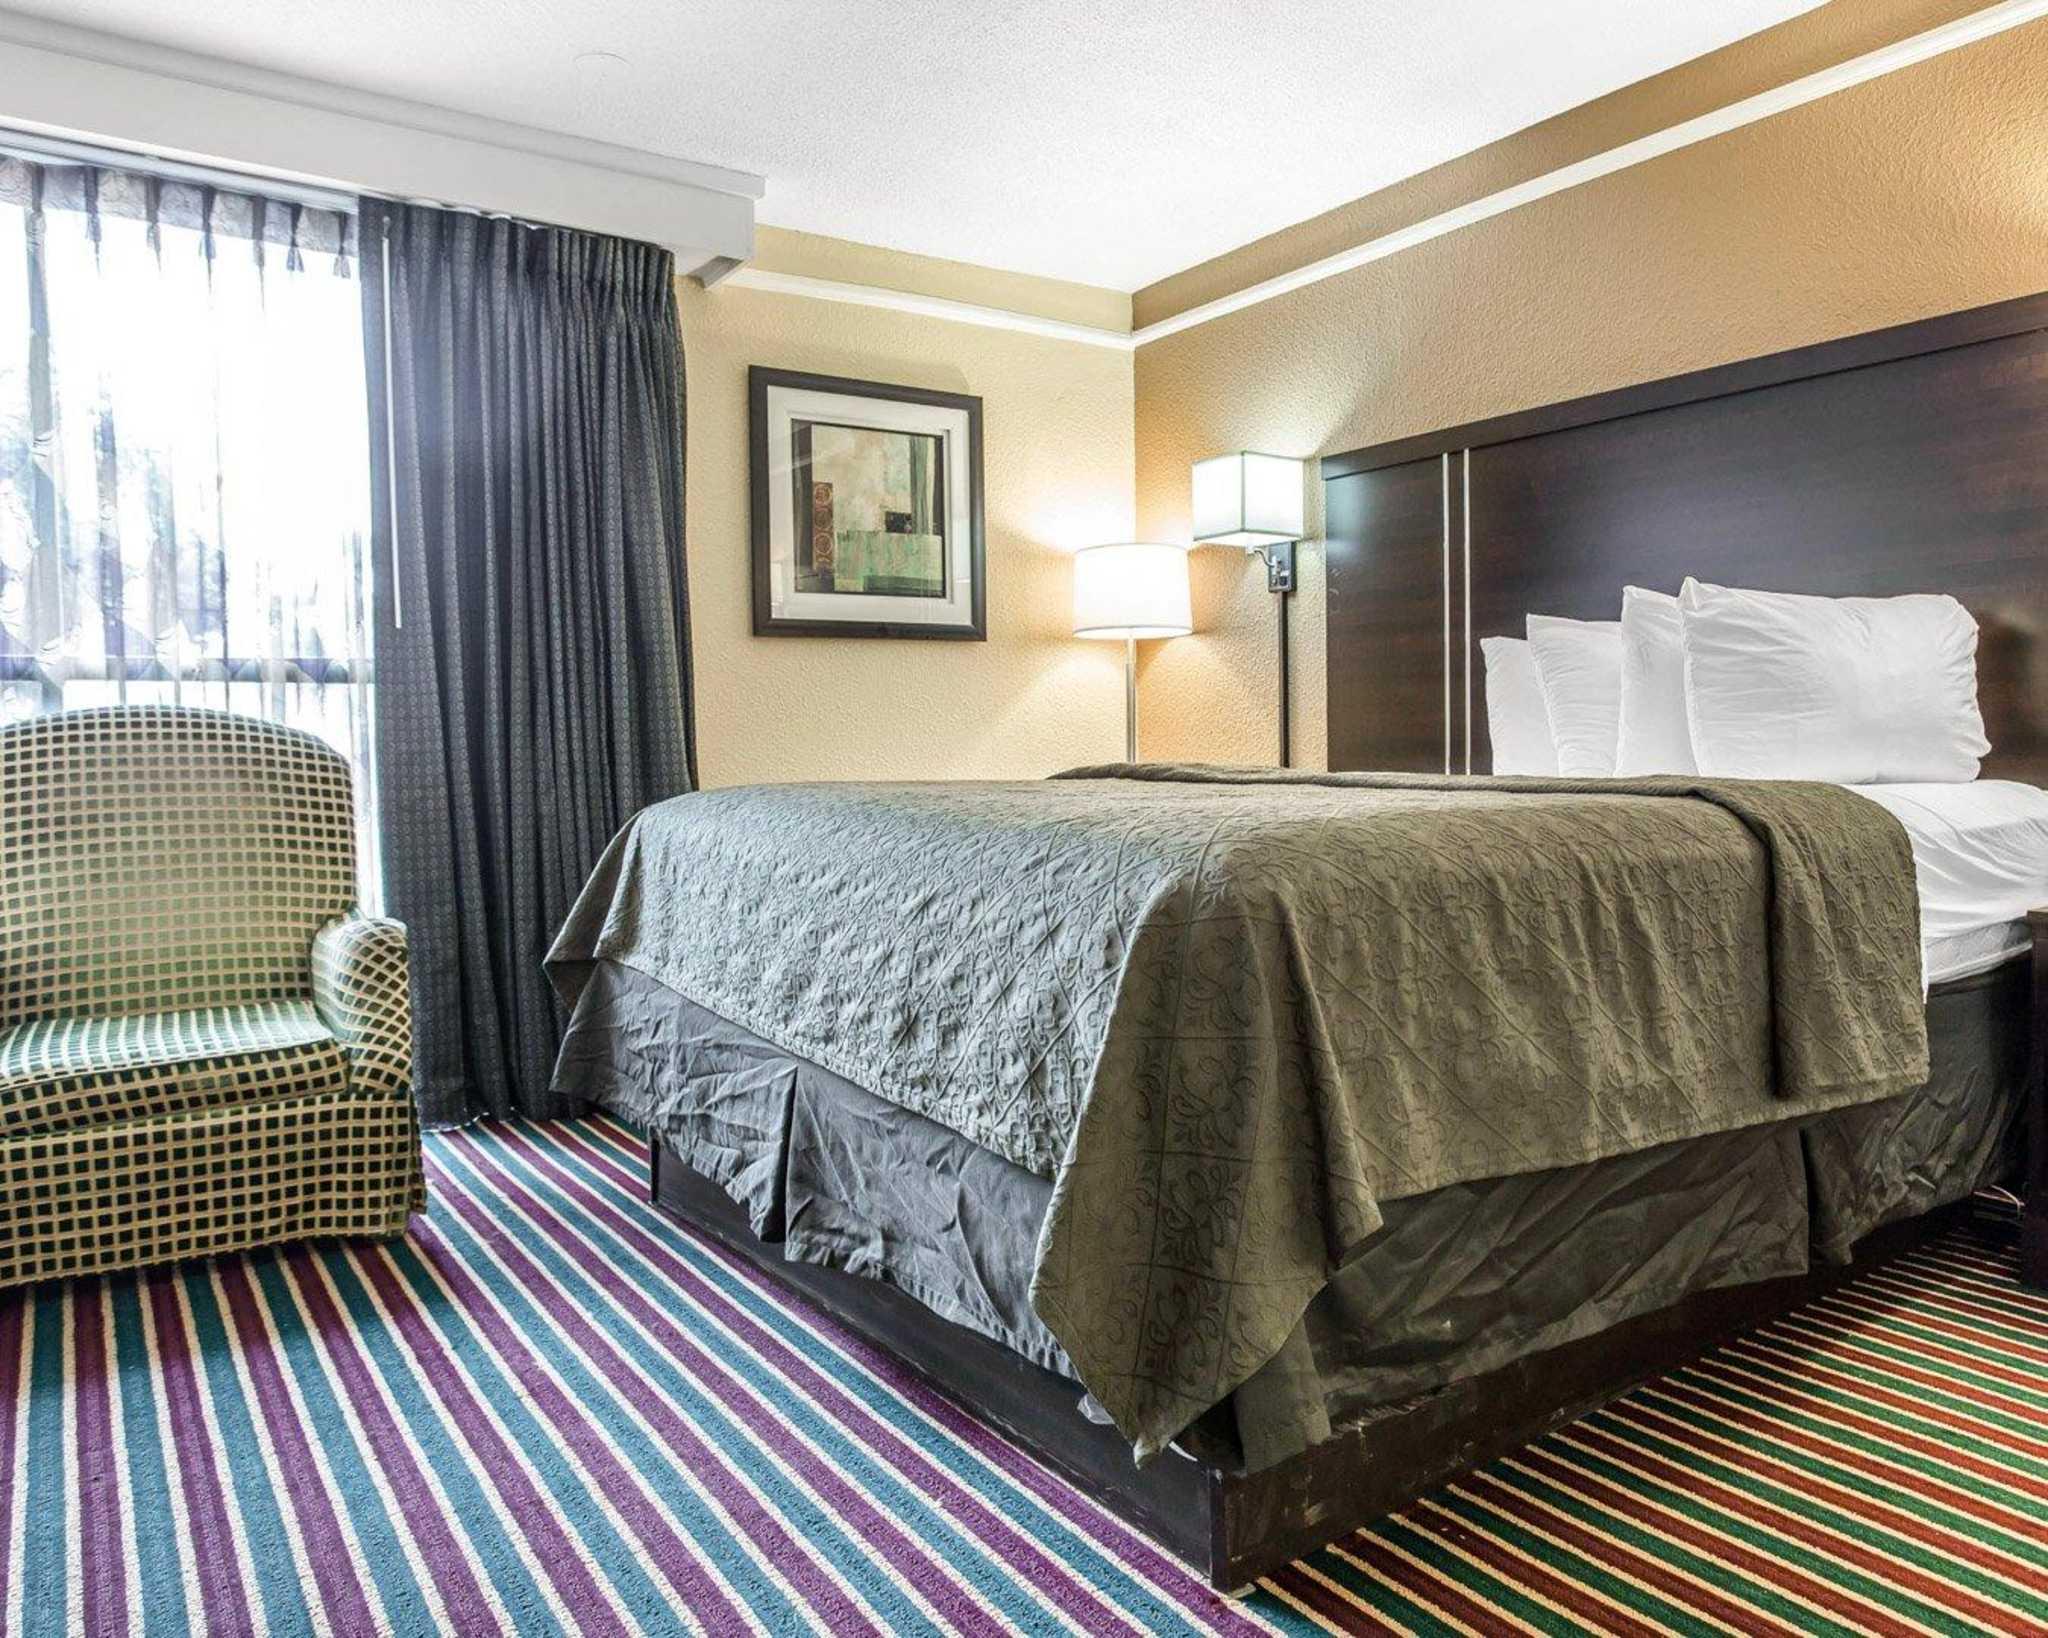 Quality Inn & Suites image 3